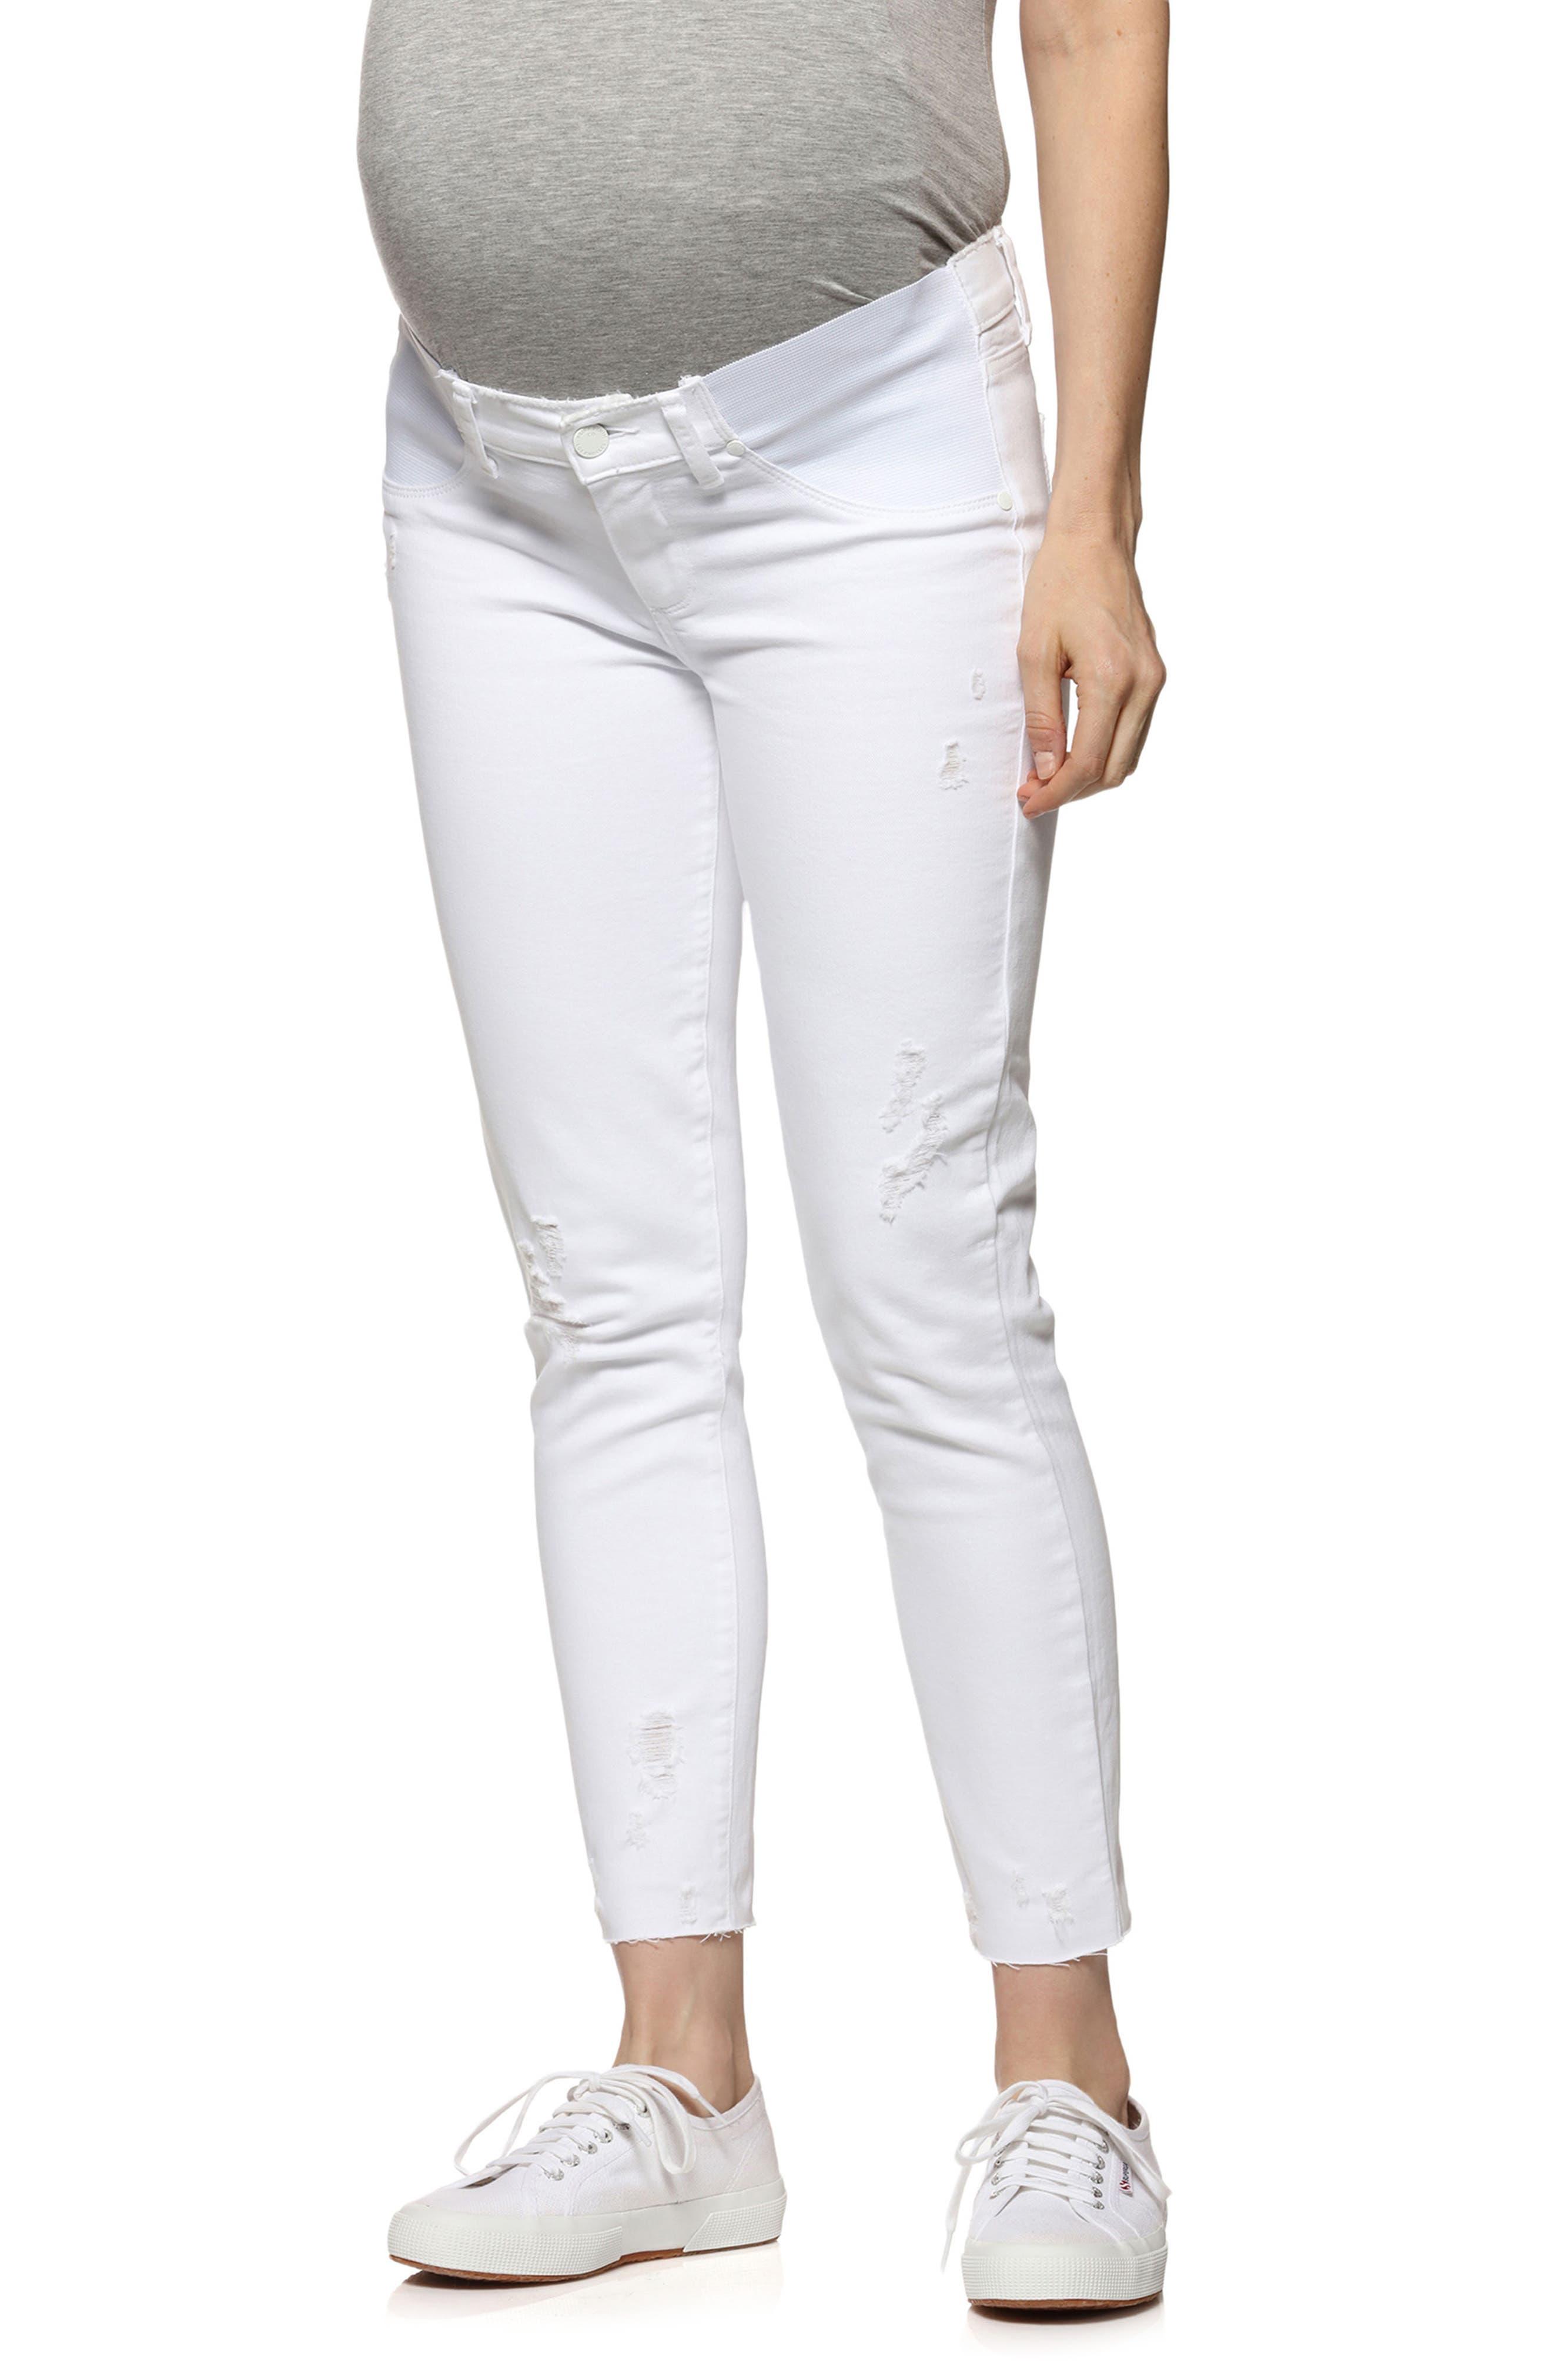 Verdugo Raw Hem Crop Skinny Maternity Jeans,                             Main thumbnail 1, color,                             100